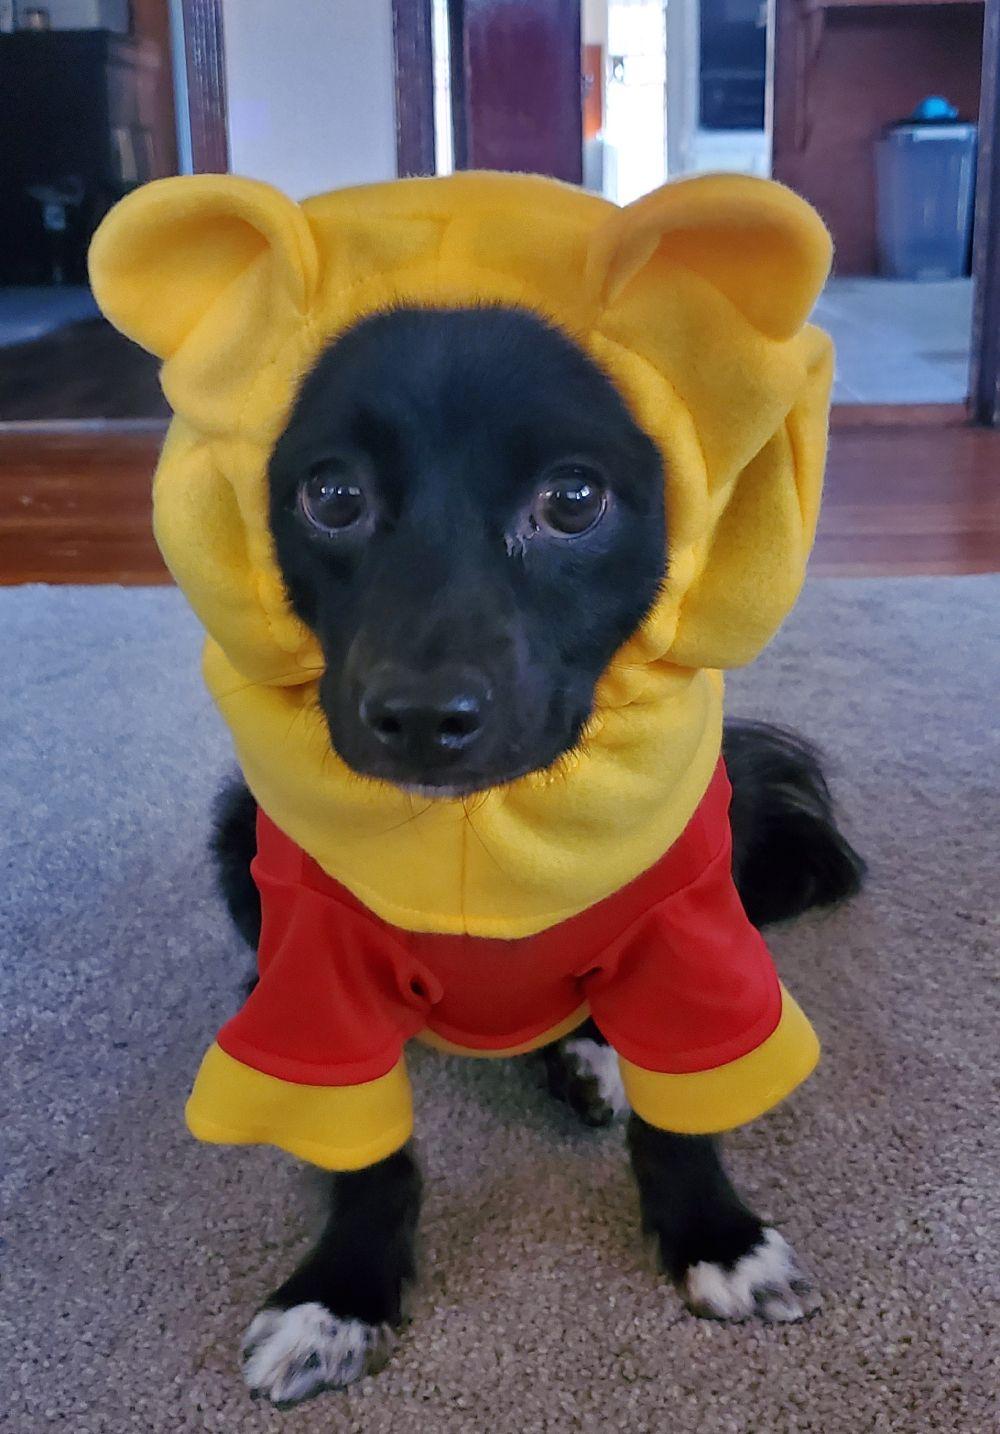 Karma as Winnie the Pooh